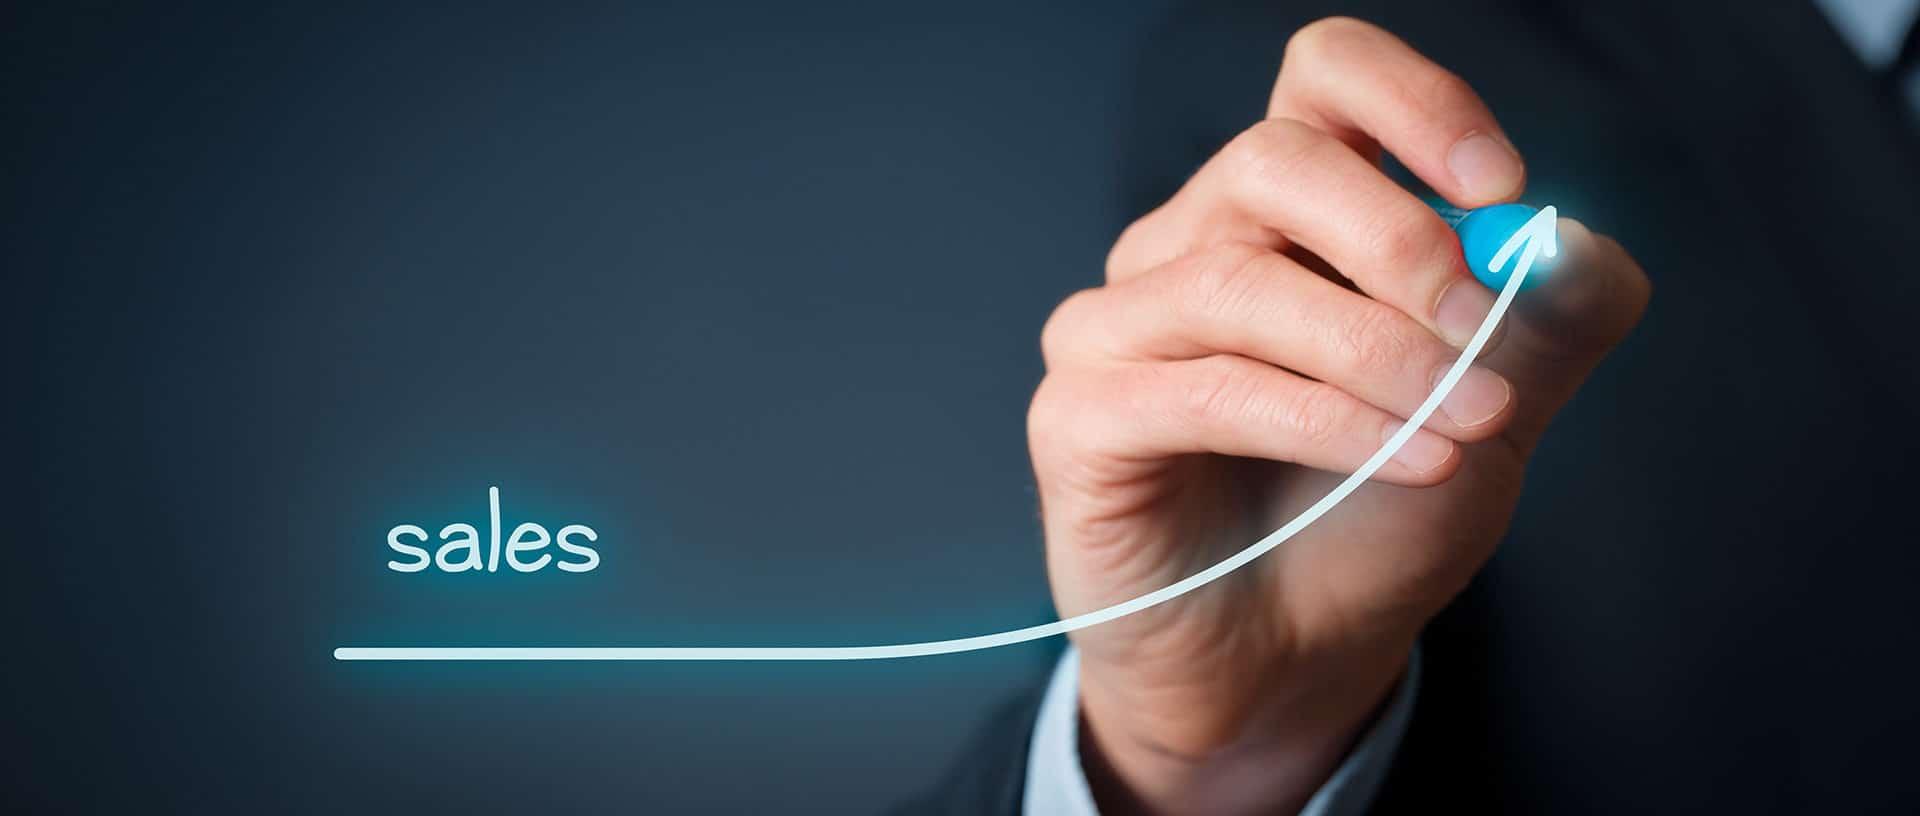 Increase company sales concept. Businessman plan sales growth.